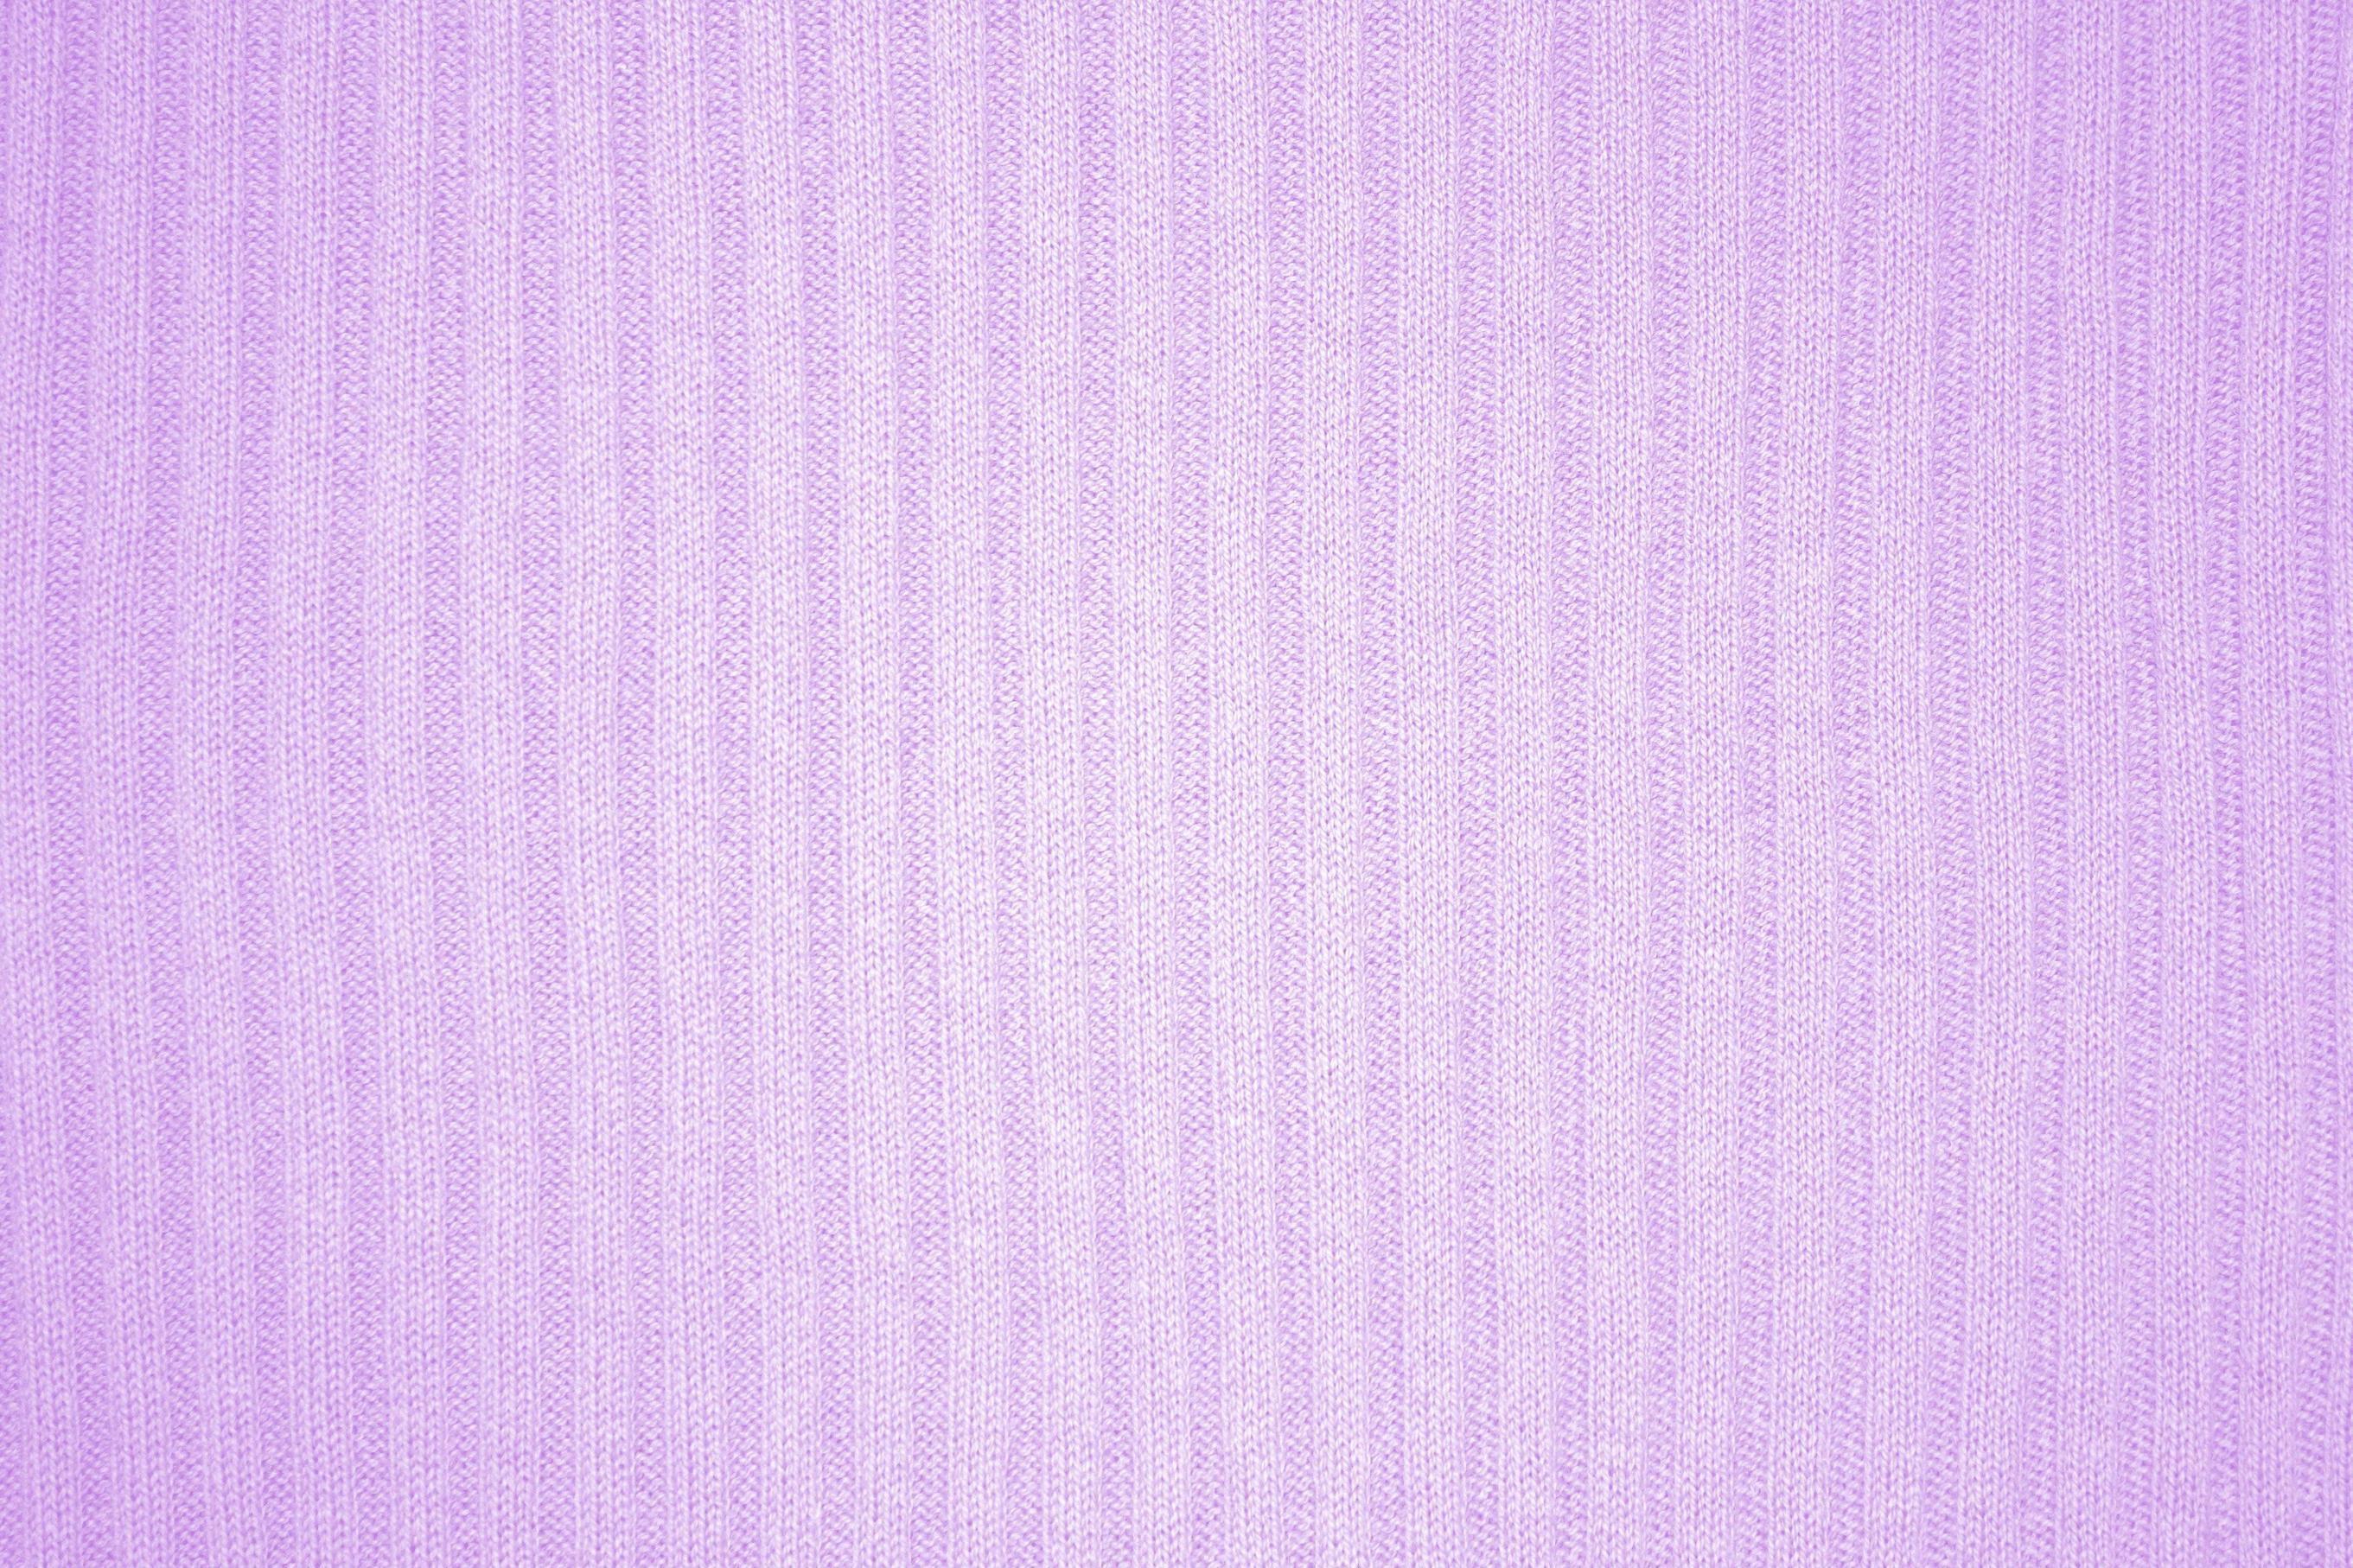 Light Purple Backgrounds – Wallpaper Cave